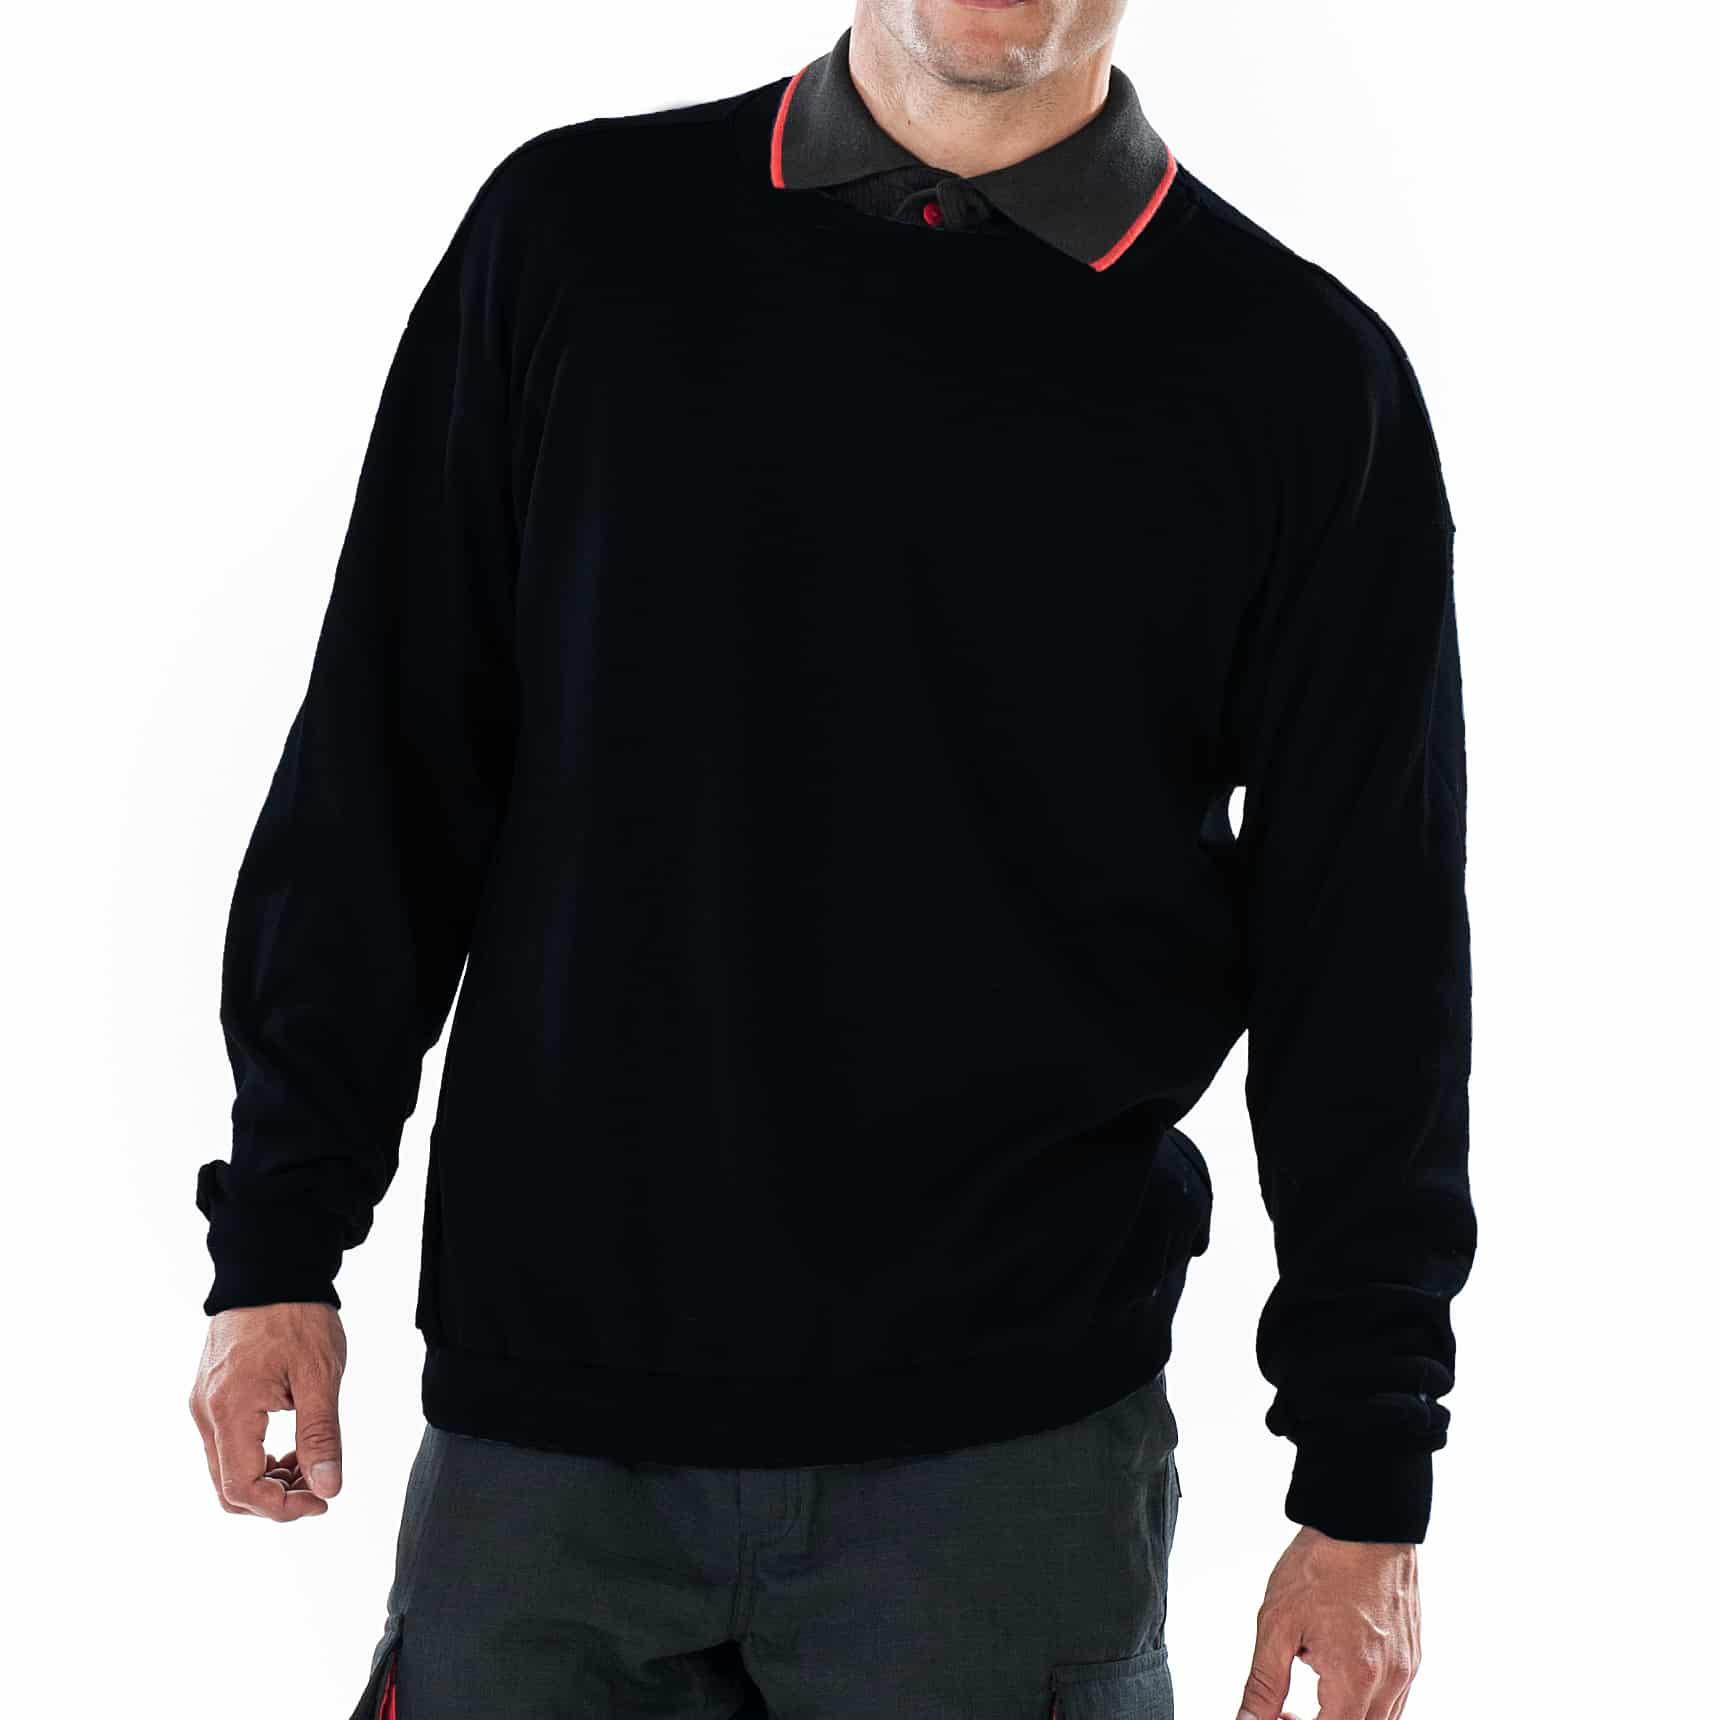 ArcBan® Black Sweatshirt close up of front